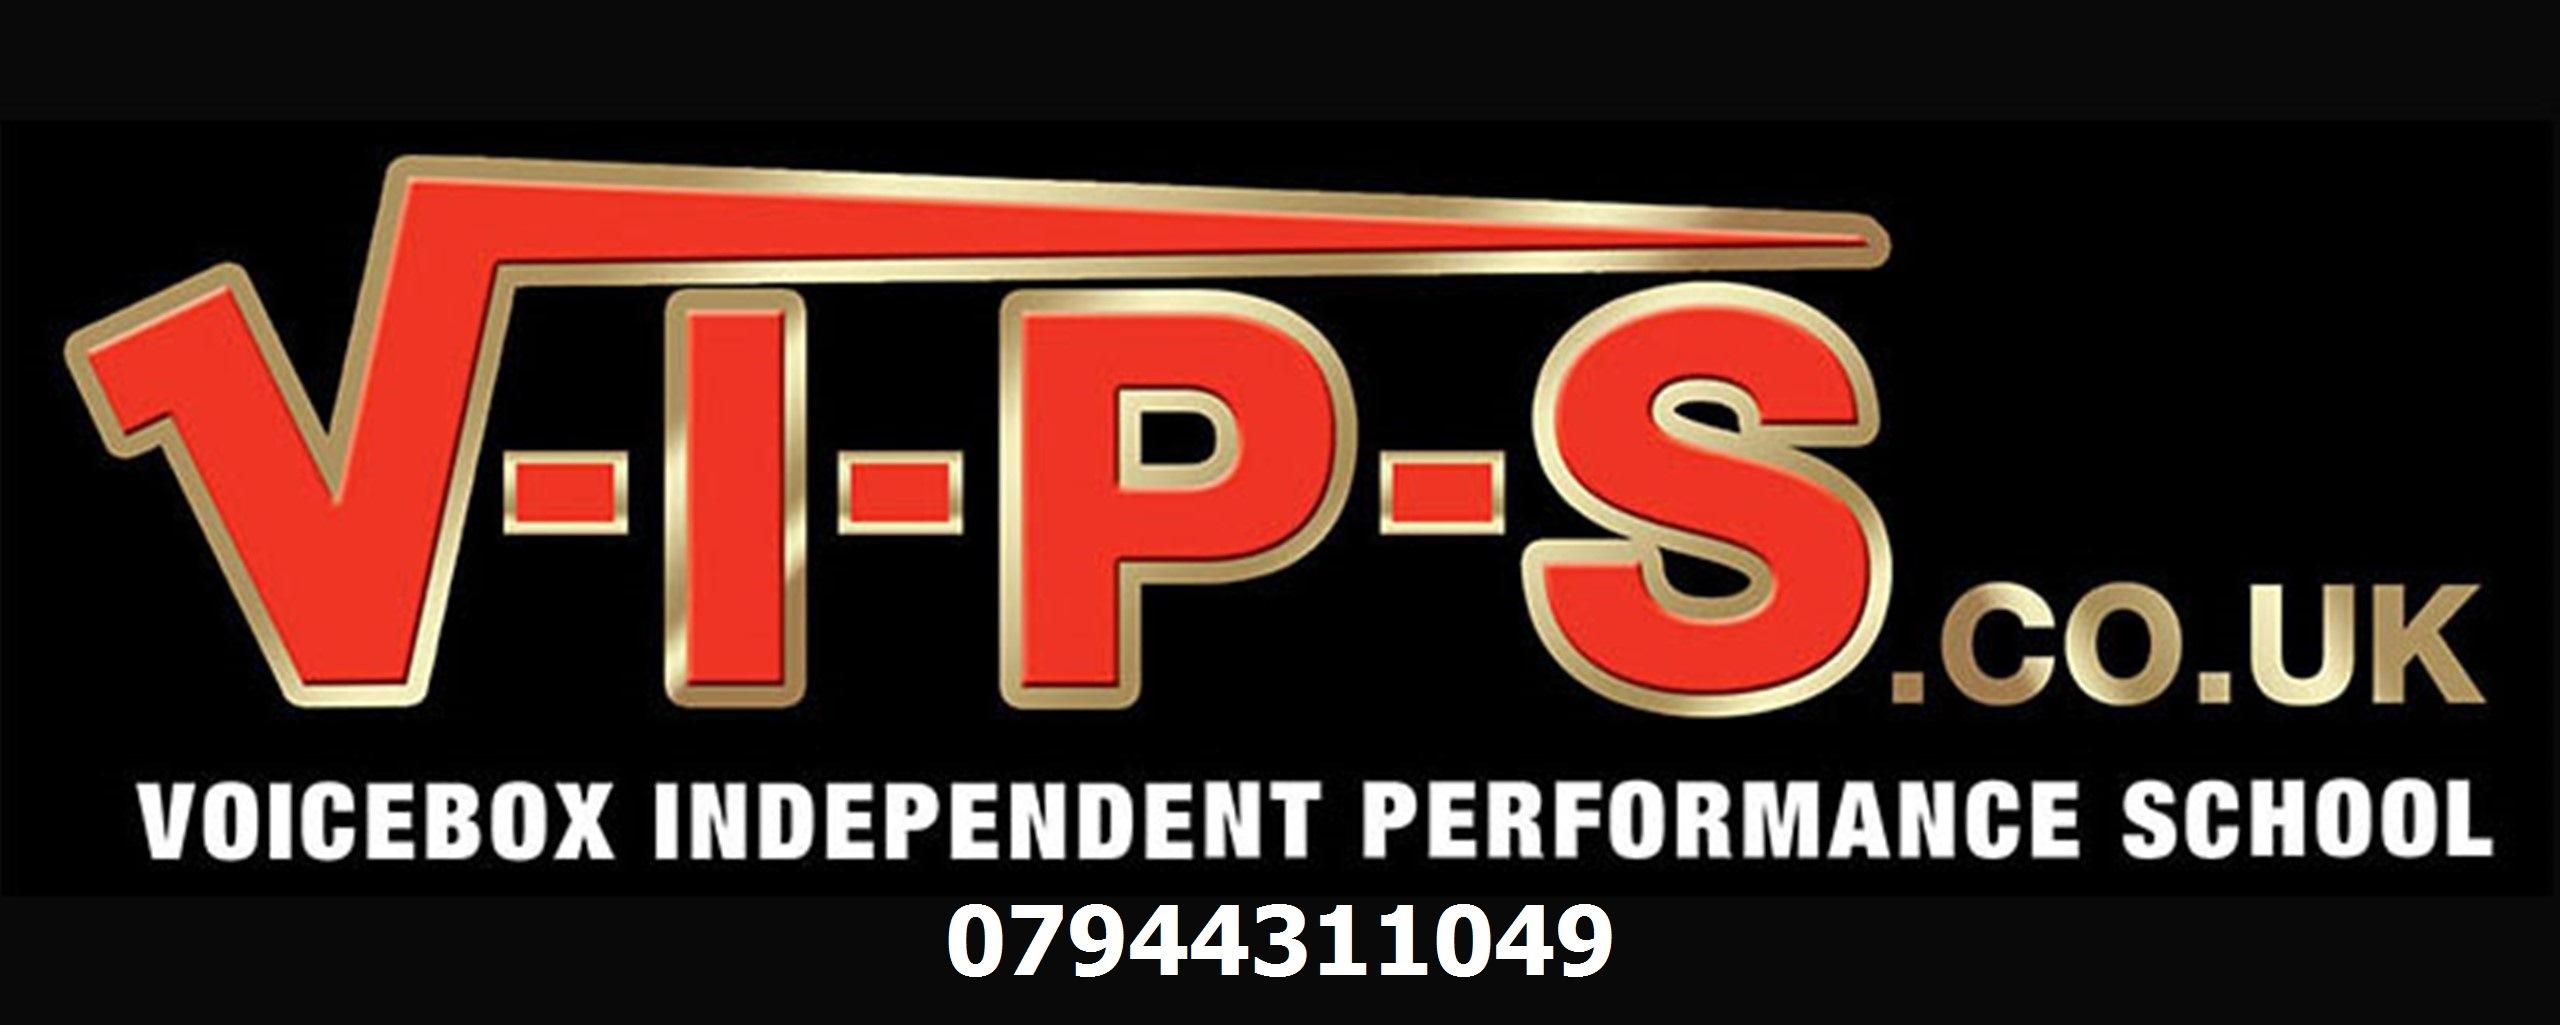 Vips-Logo-And-Phone